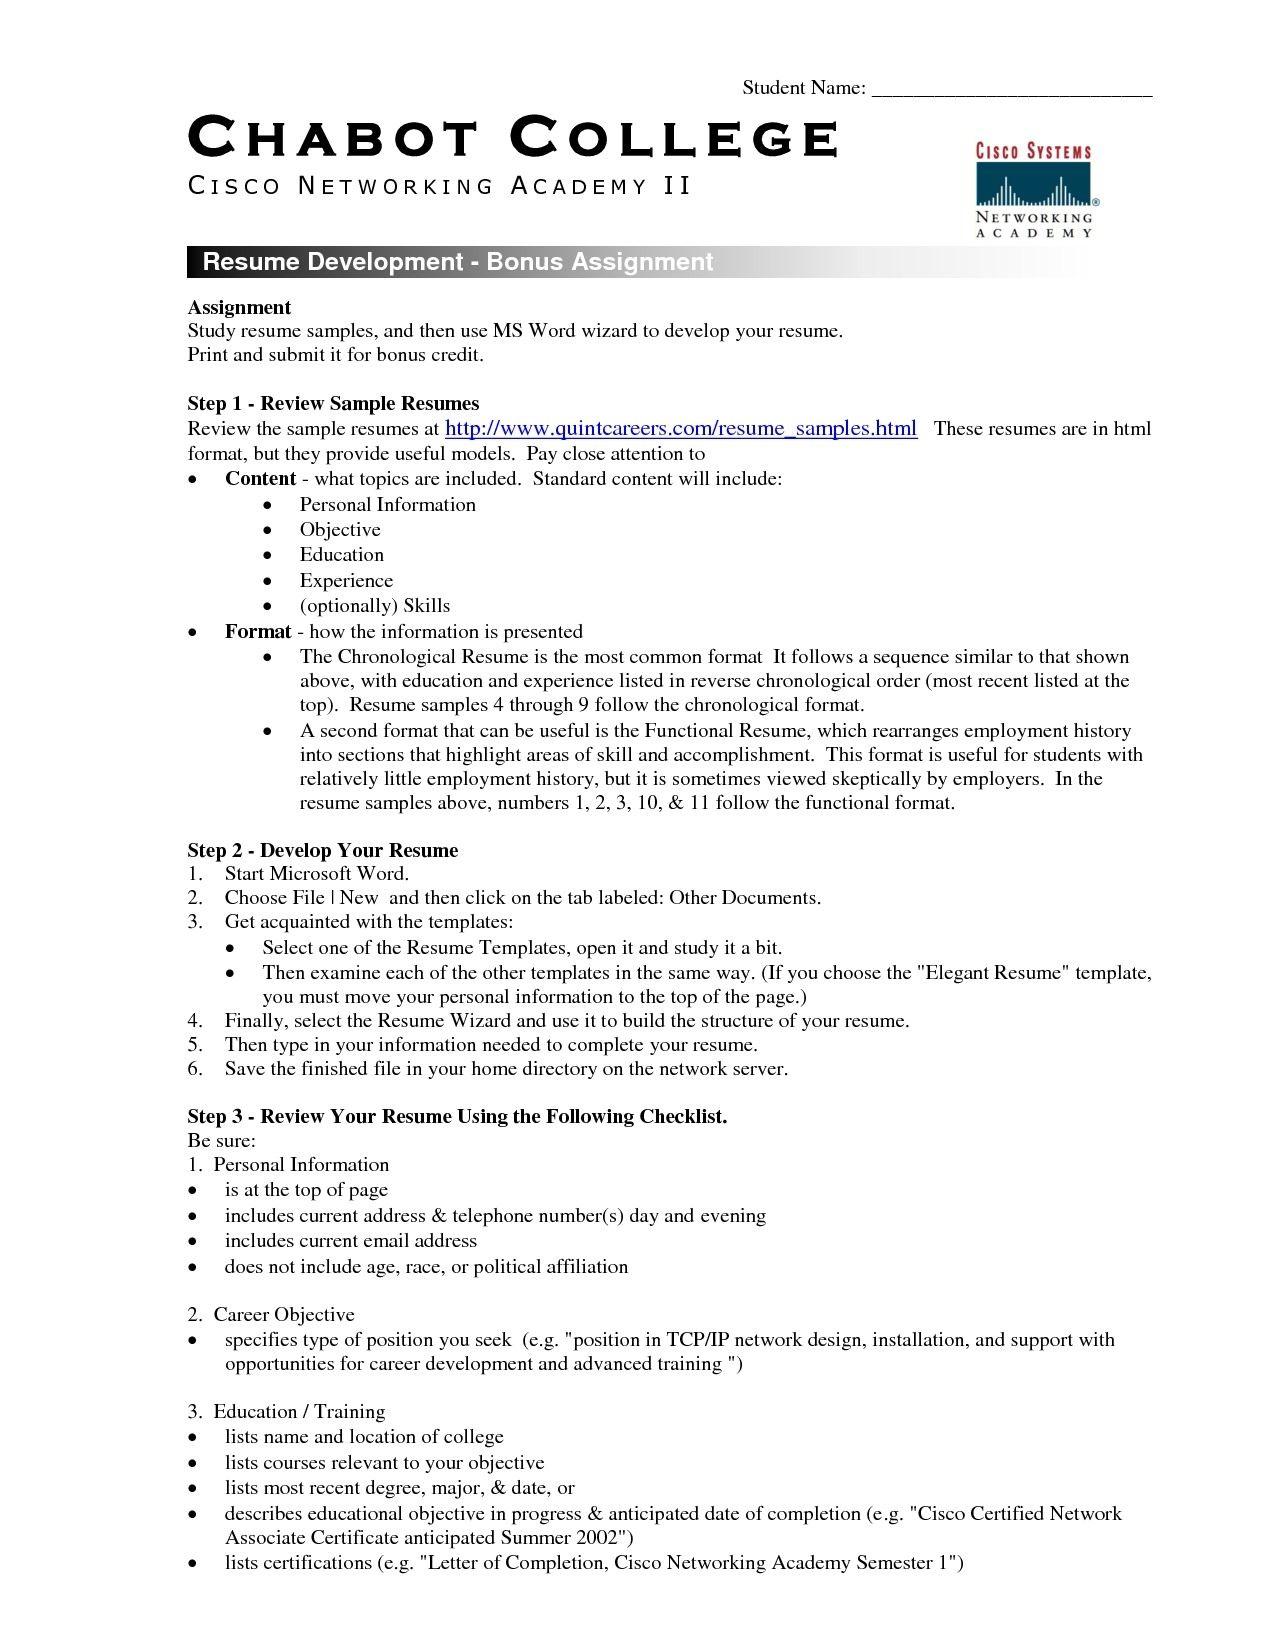 Resume Format Dates Resume format examples, Job resume